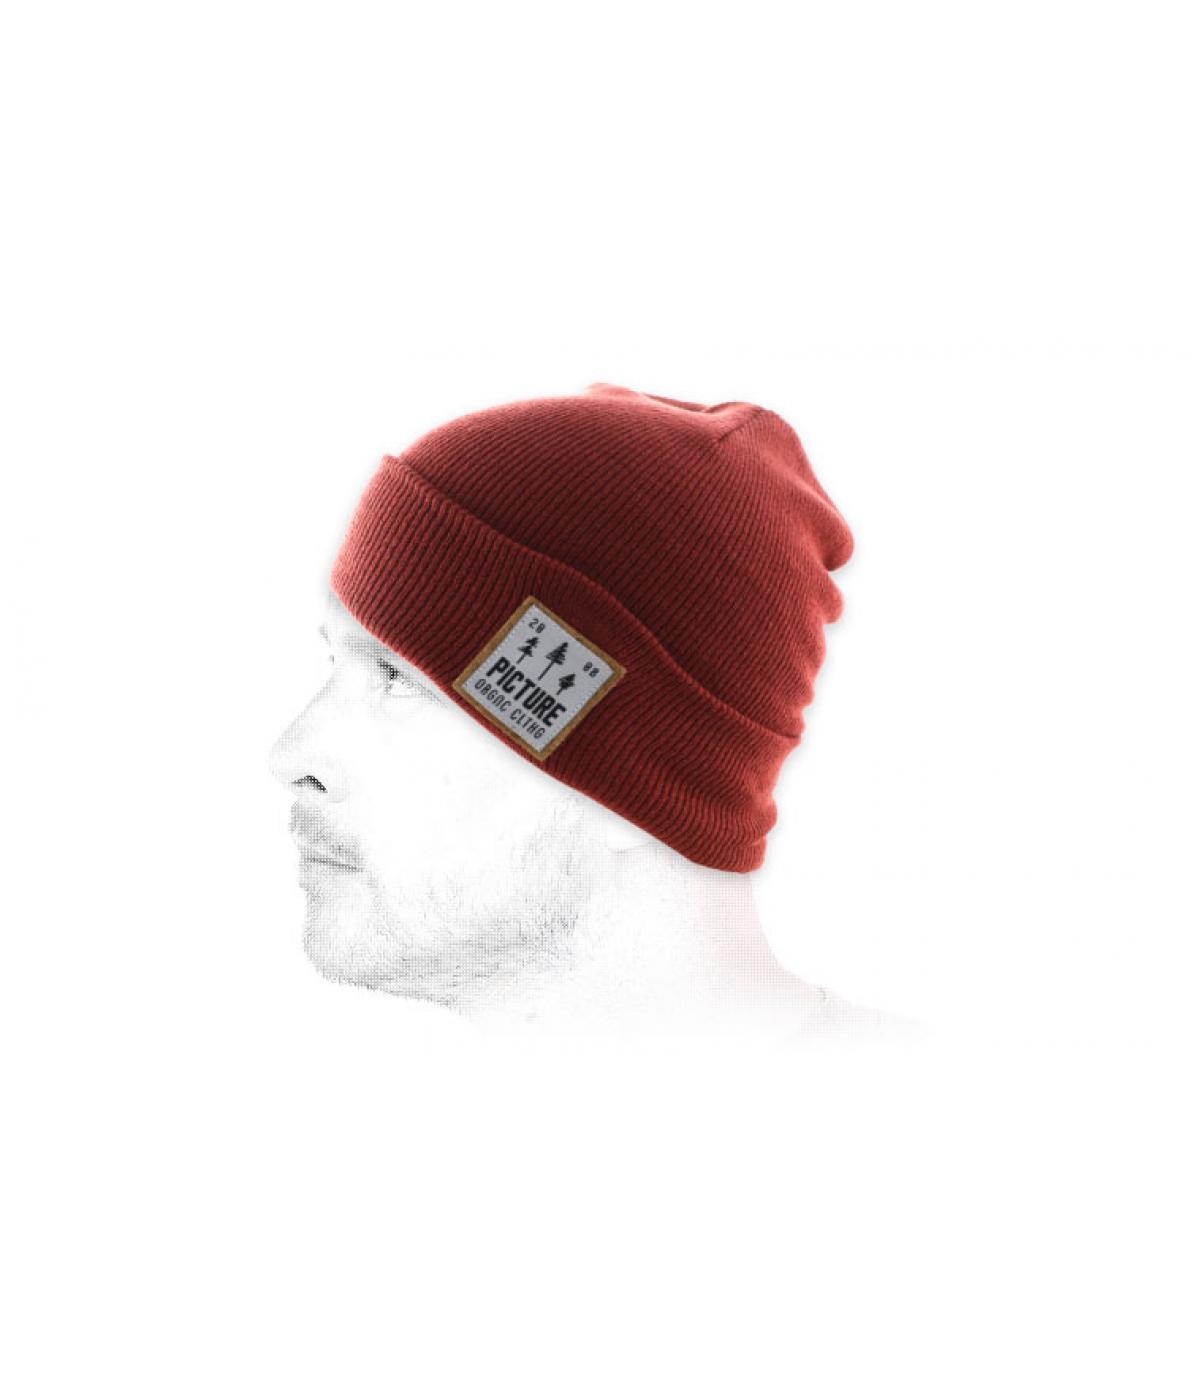 Mütze Revers ziegelrot Picture